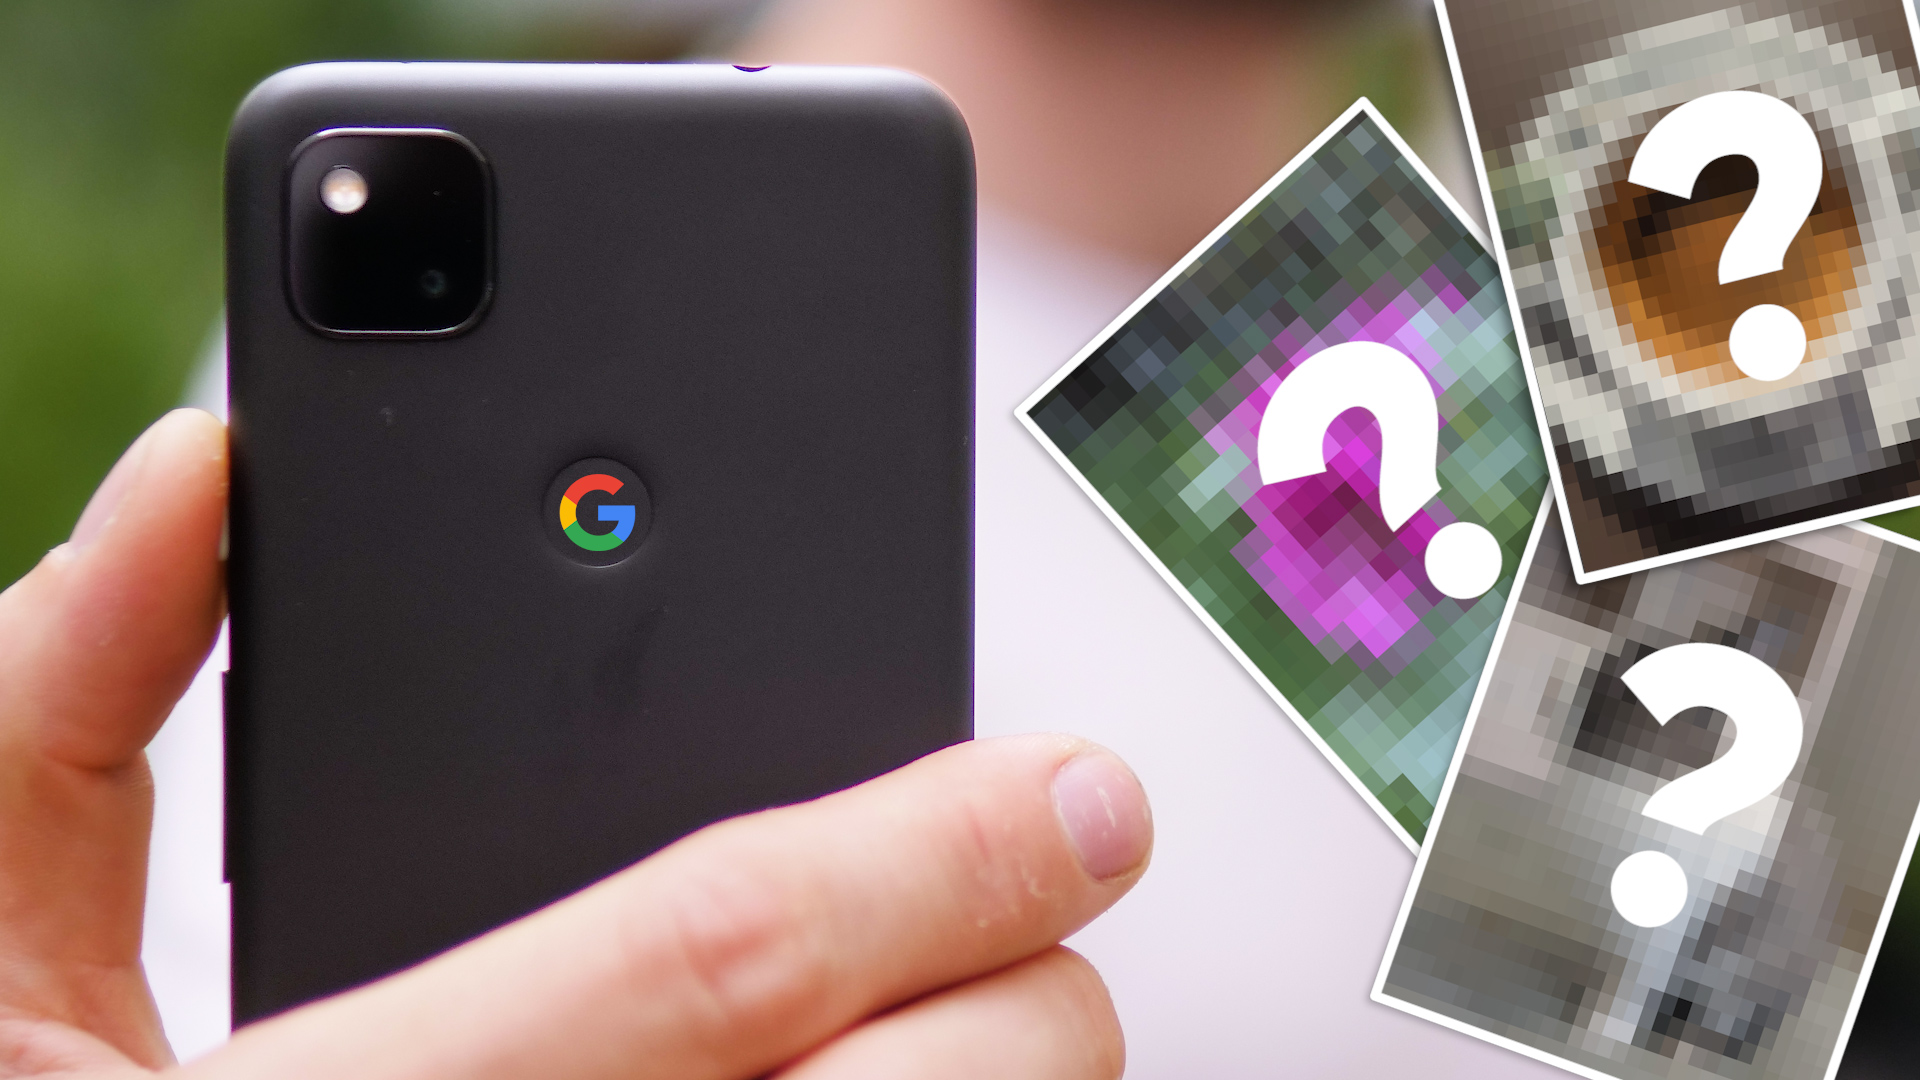 Pixel 4a : que valent les photos d'un smartphone à 350 € ? (vs iPhone 11 Pro)